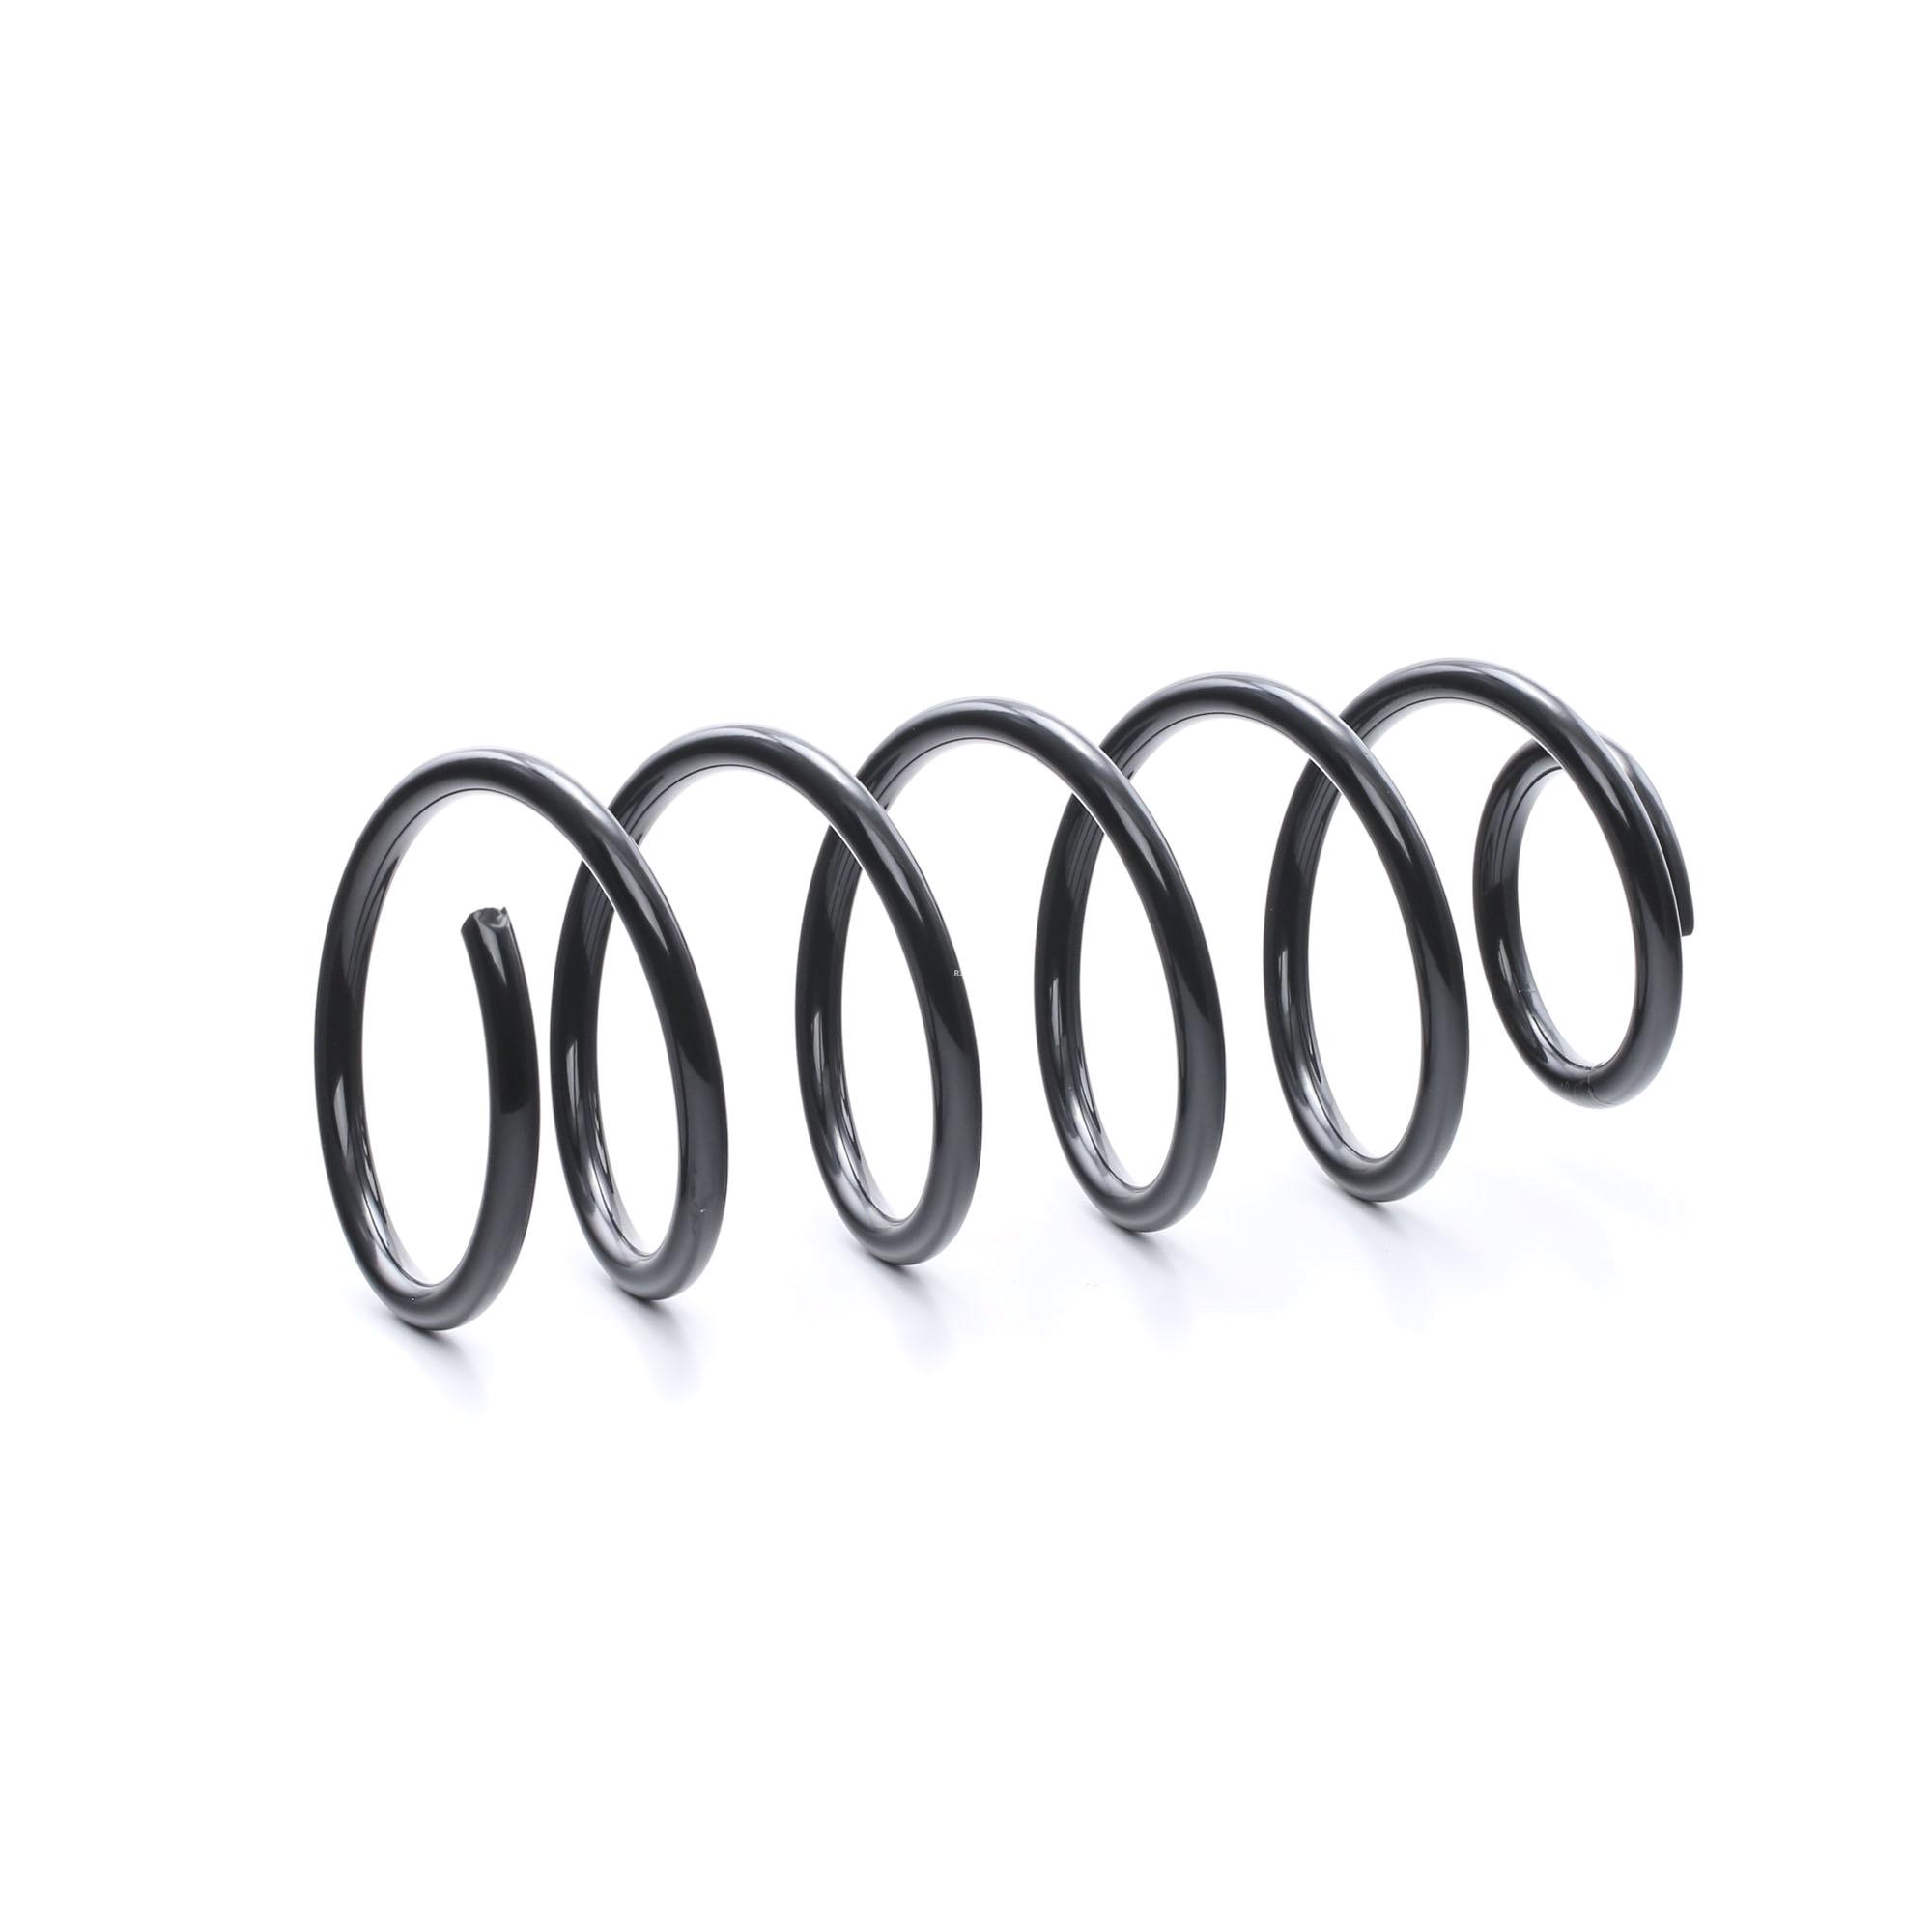 VW POLO 2021 Fahrwerksfedern - Original RIDEX 188C0195 Länge: 350mm, Länge: 350mm, Ø: 140mm, Dicke/Stärke: 12mm